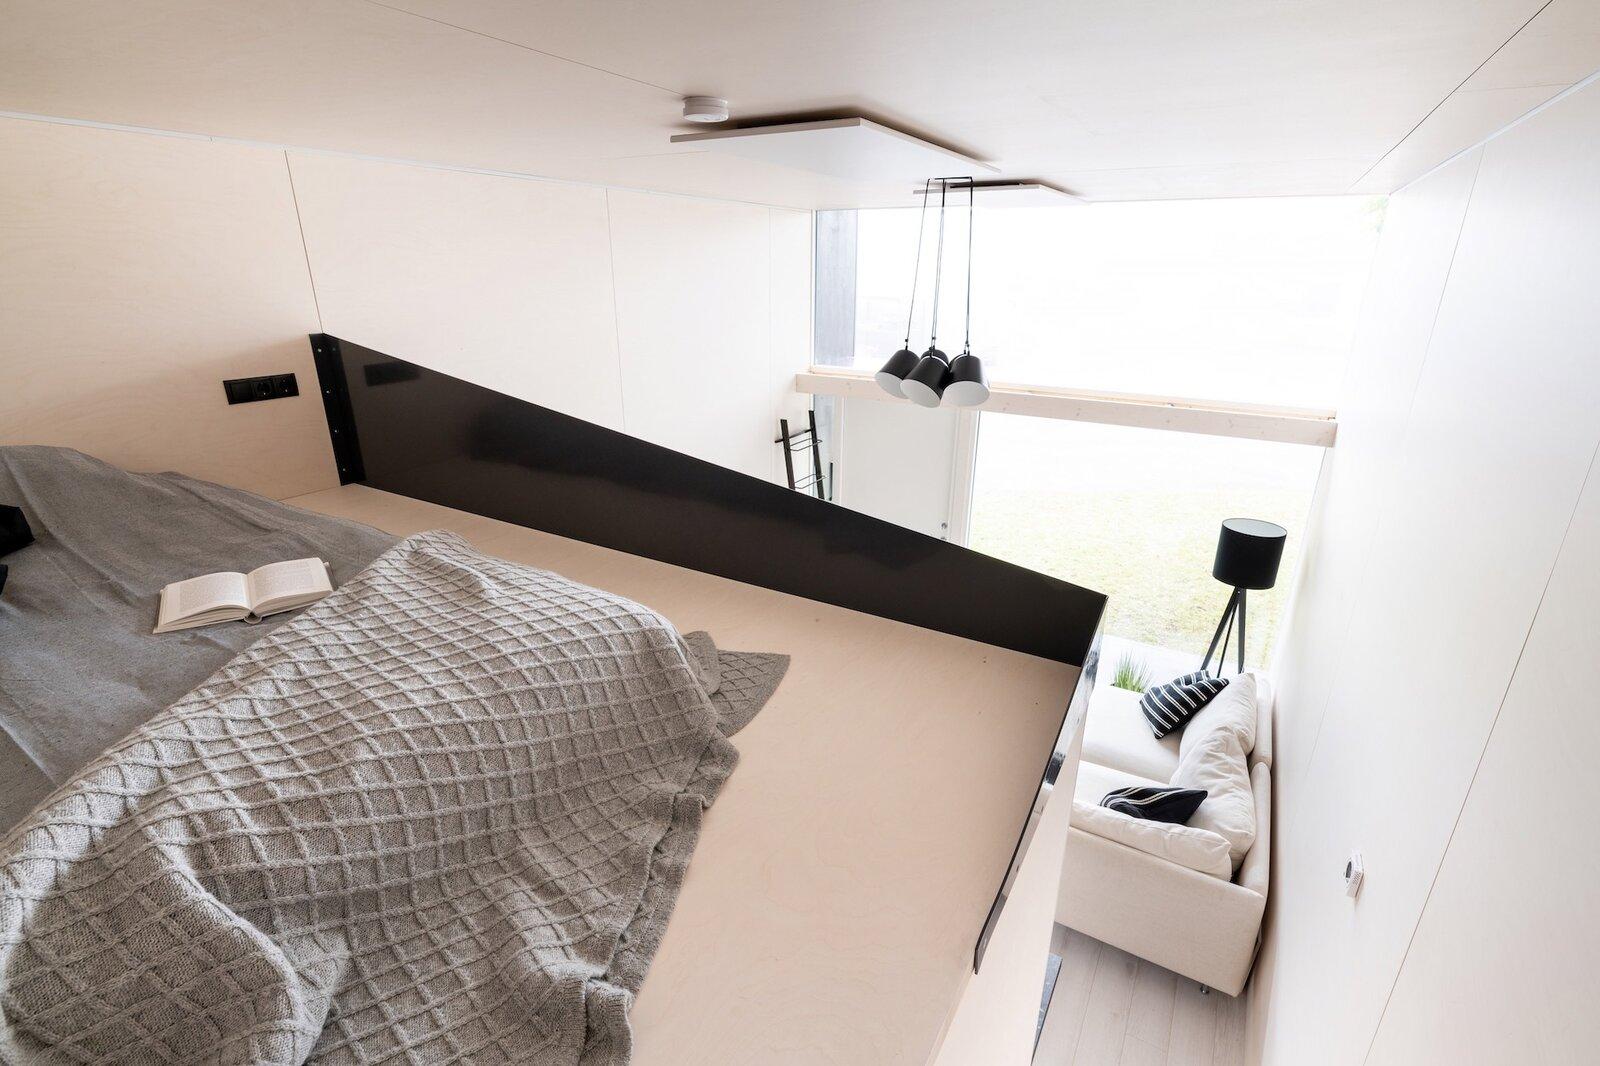 KODA Loft bedroom